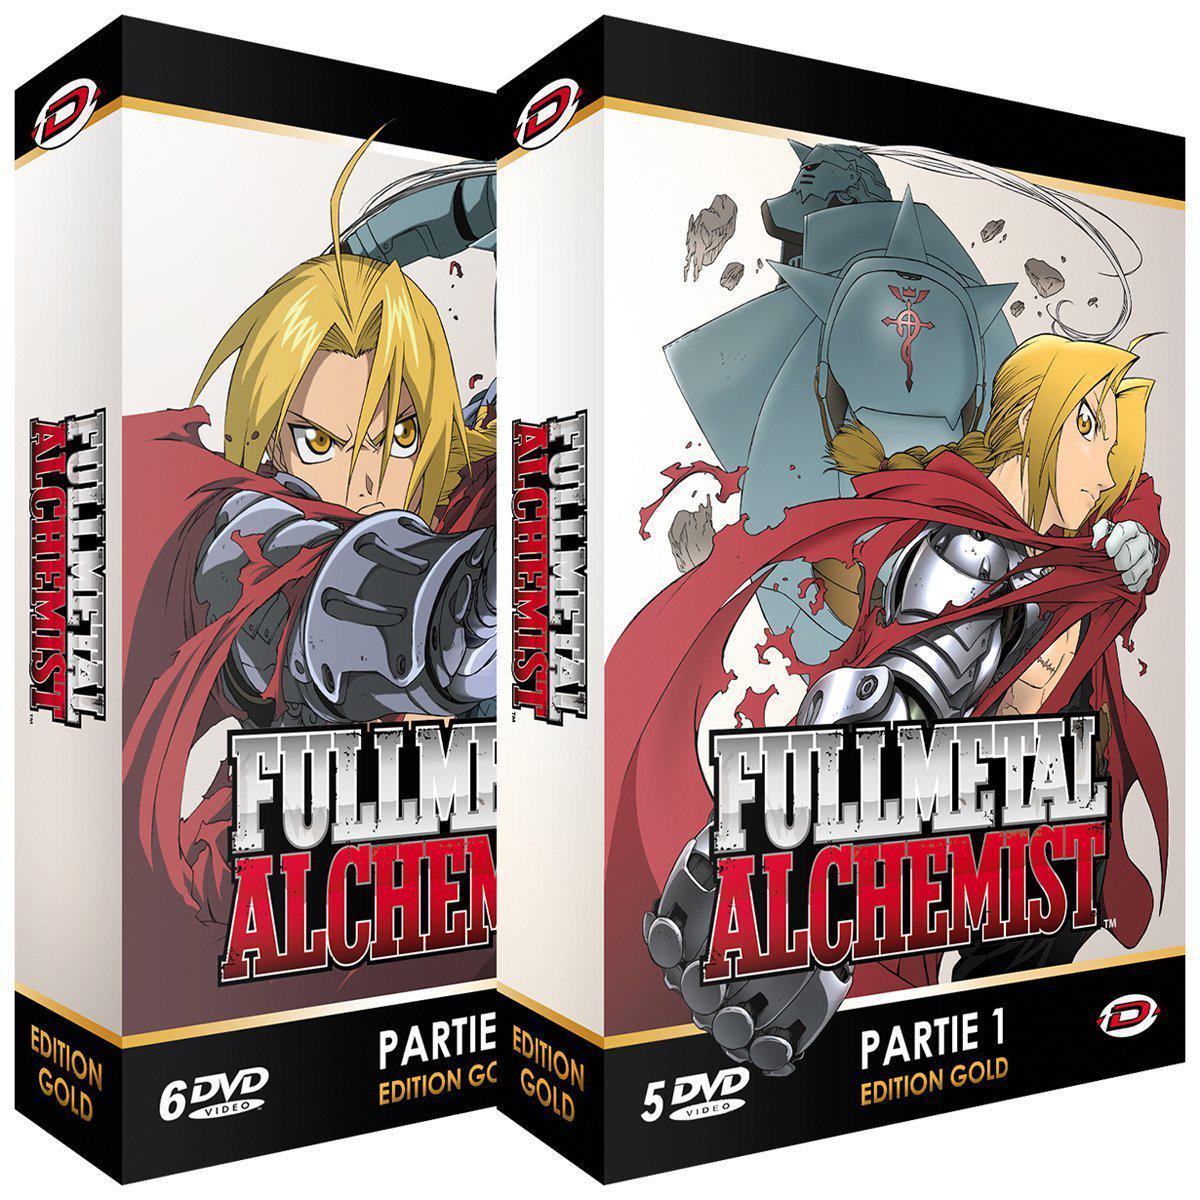 Coffrets DVD Fullmetal Alchemist - Intégrale Edition Gold (11 DVD + Livrets)